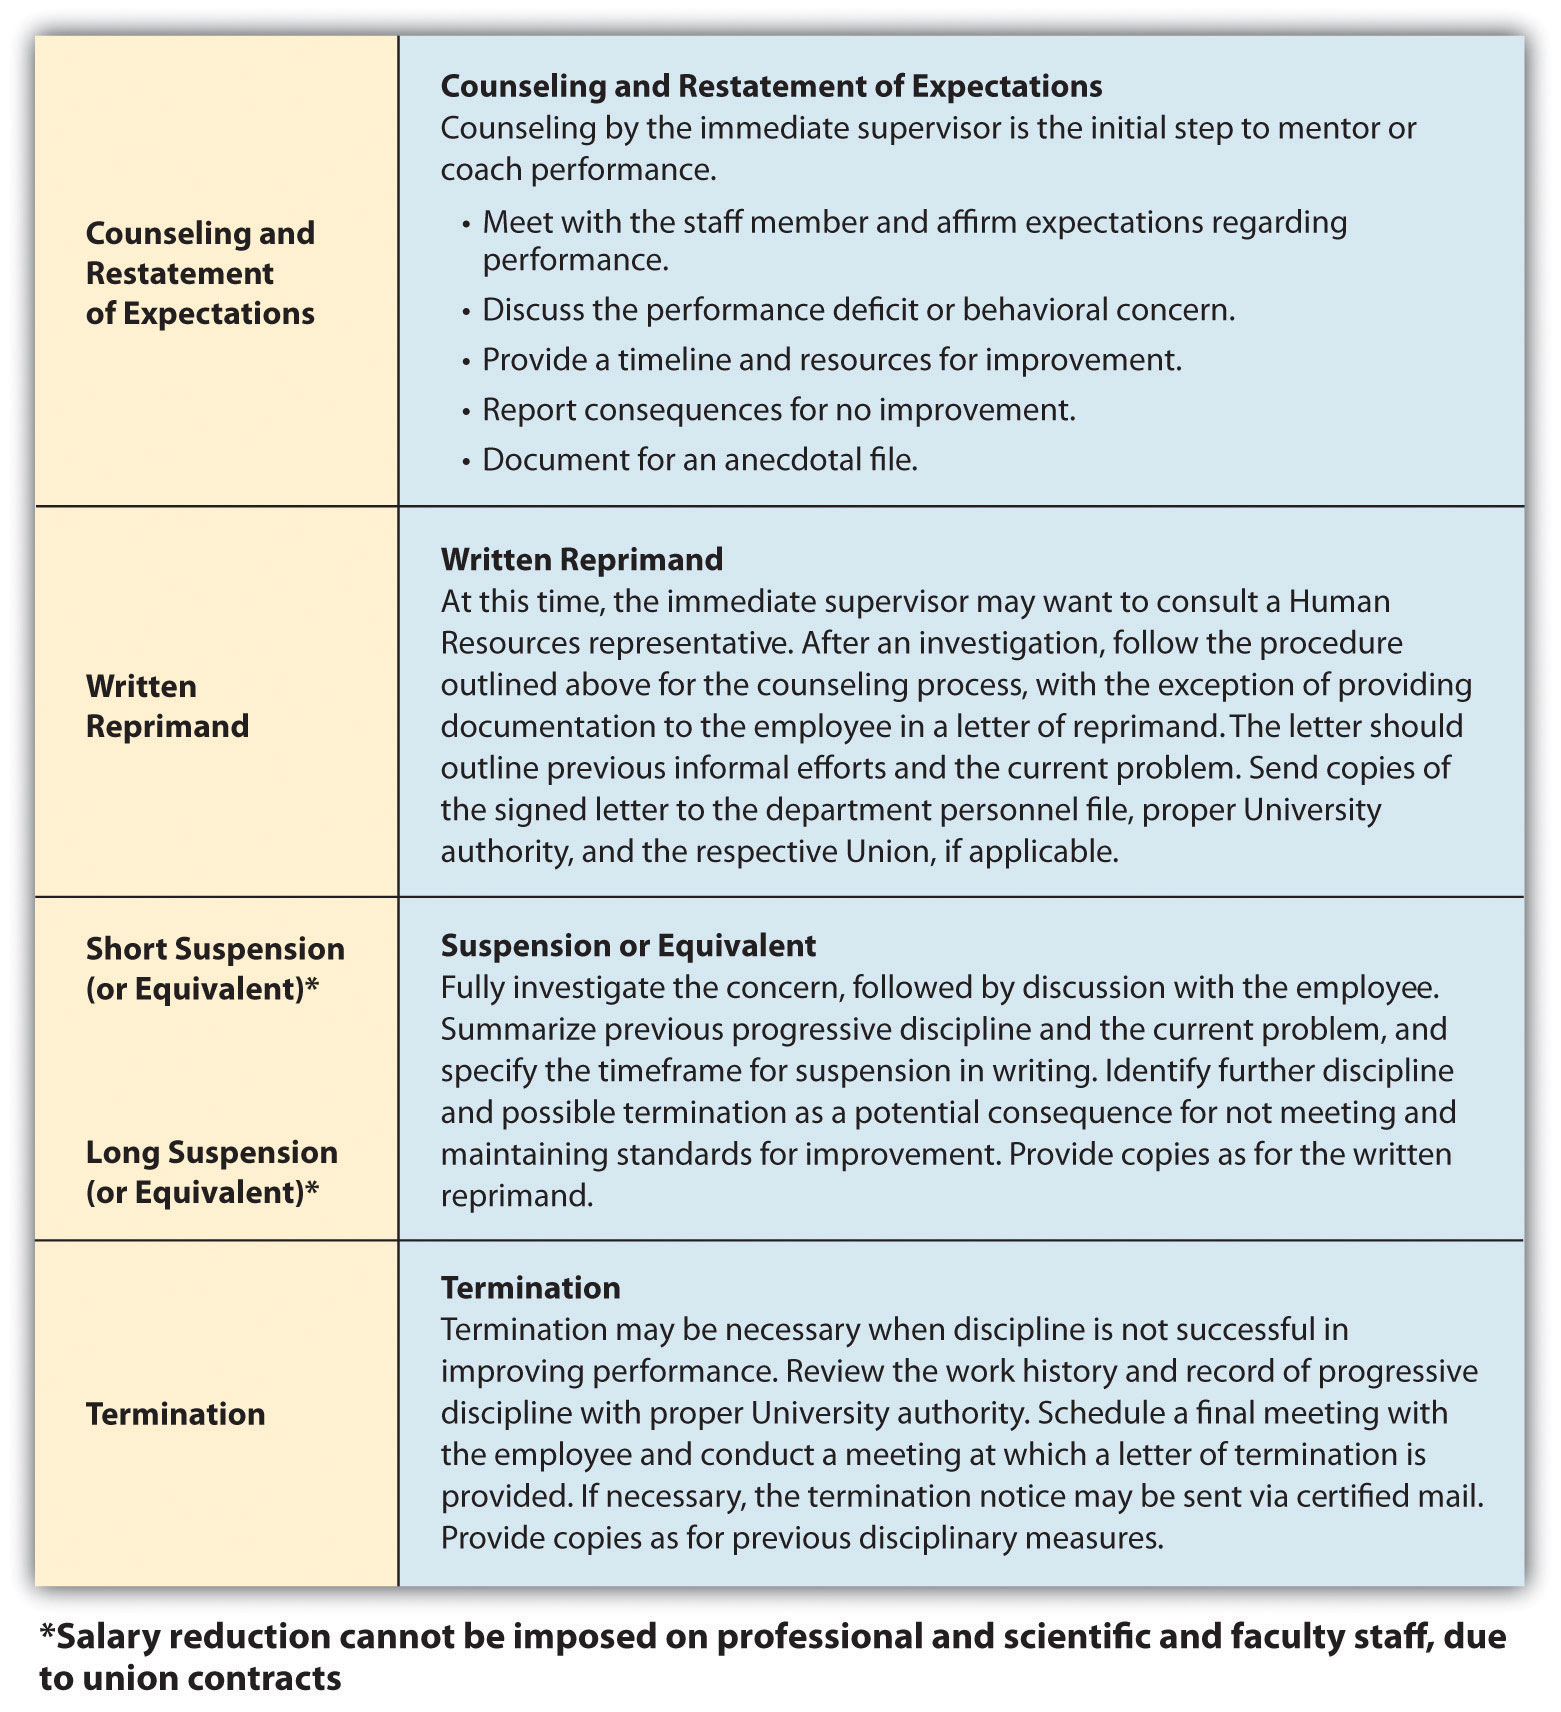 Human Resource Management V1 0 Flatworld